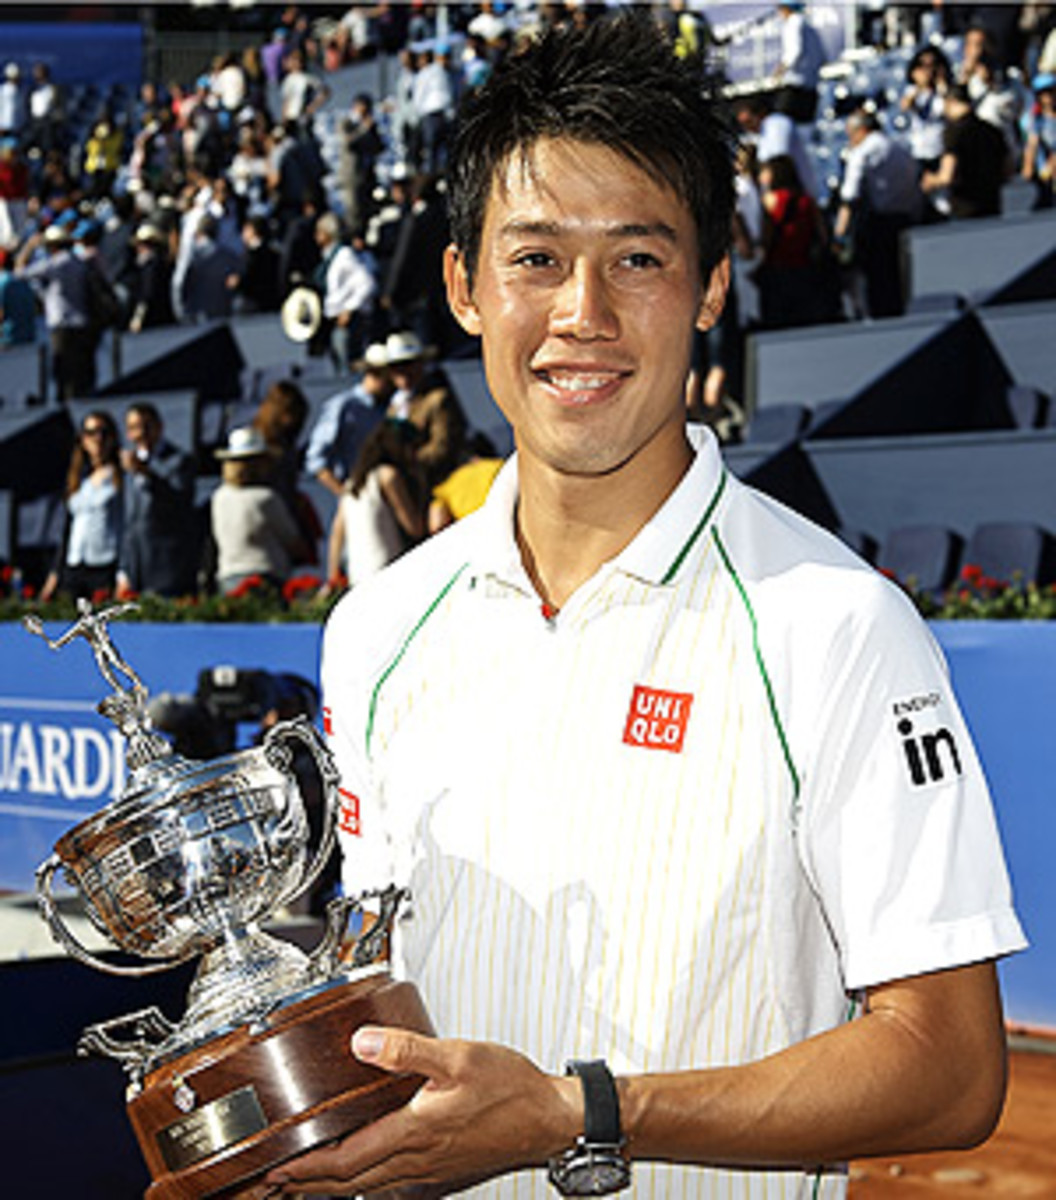 Kei Nishikori breezed through to win the Barcelona Open following Rafael Nadal's loss in the quarterfinals.